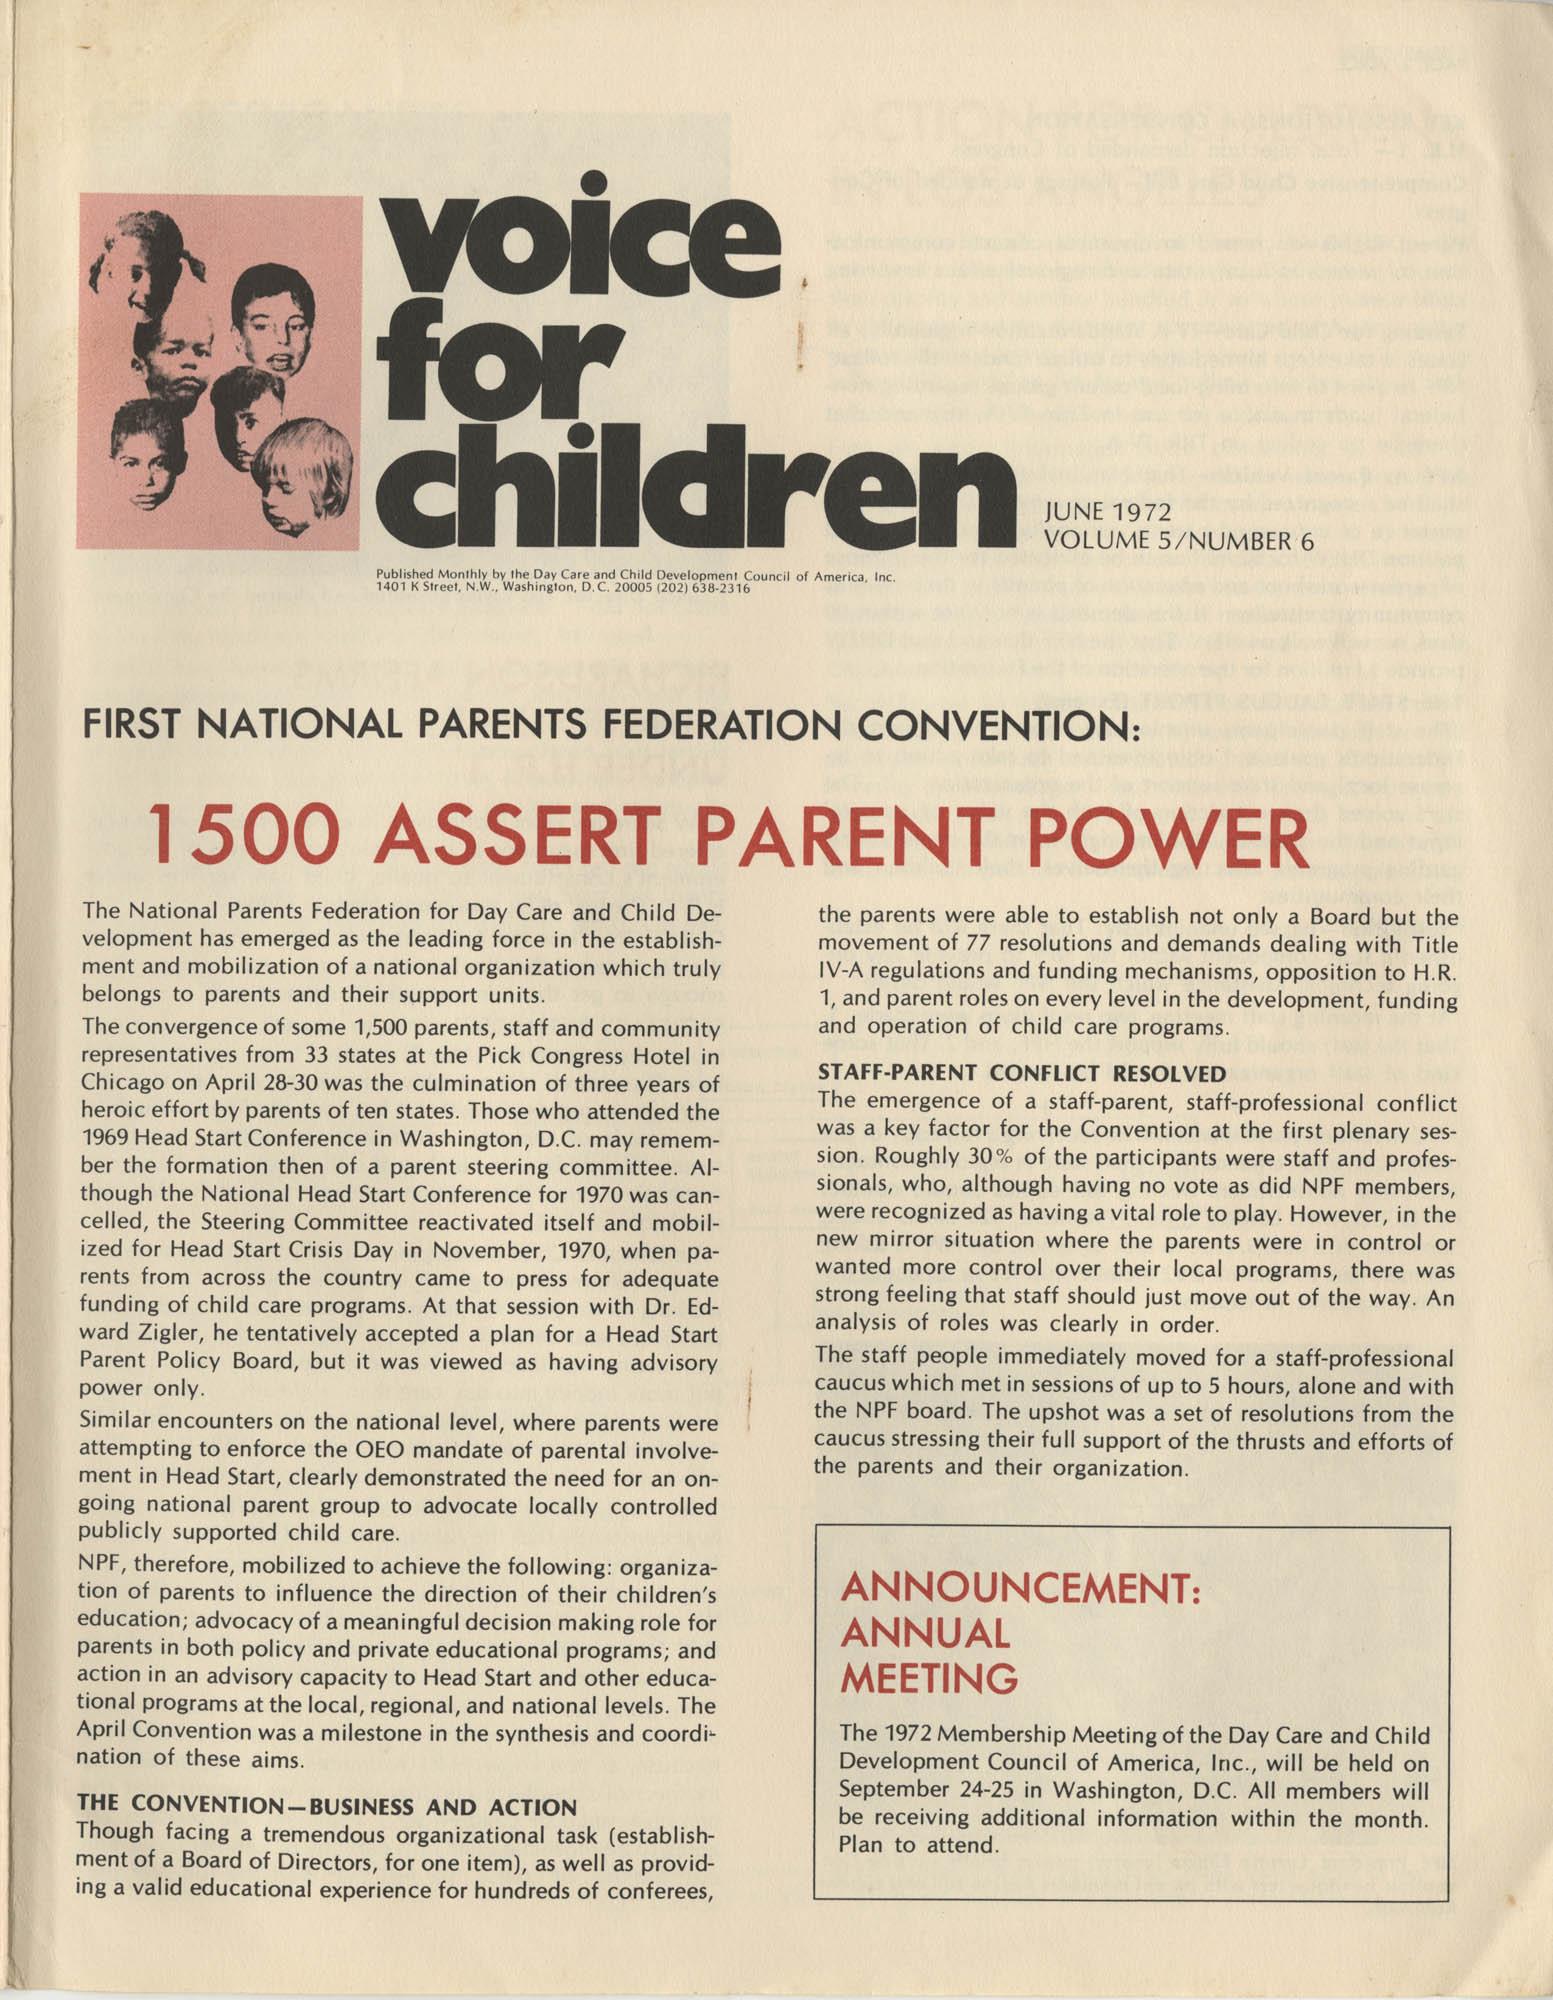 Voice For Children, Volume 5, Number 6